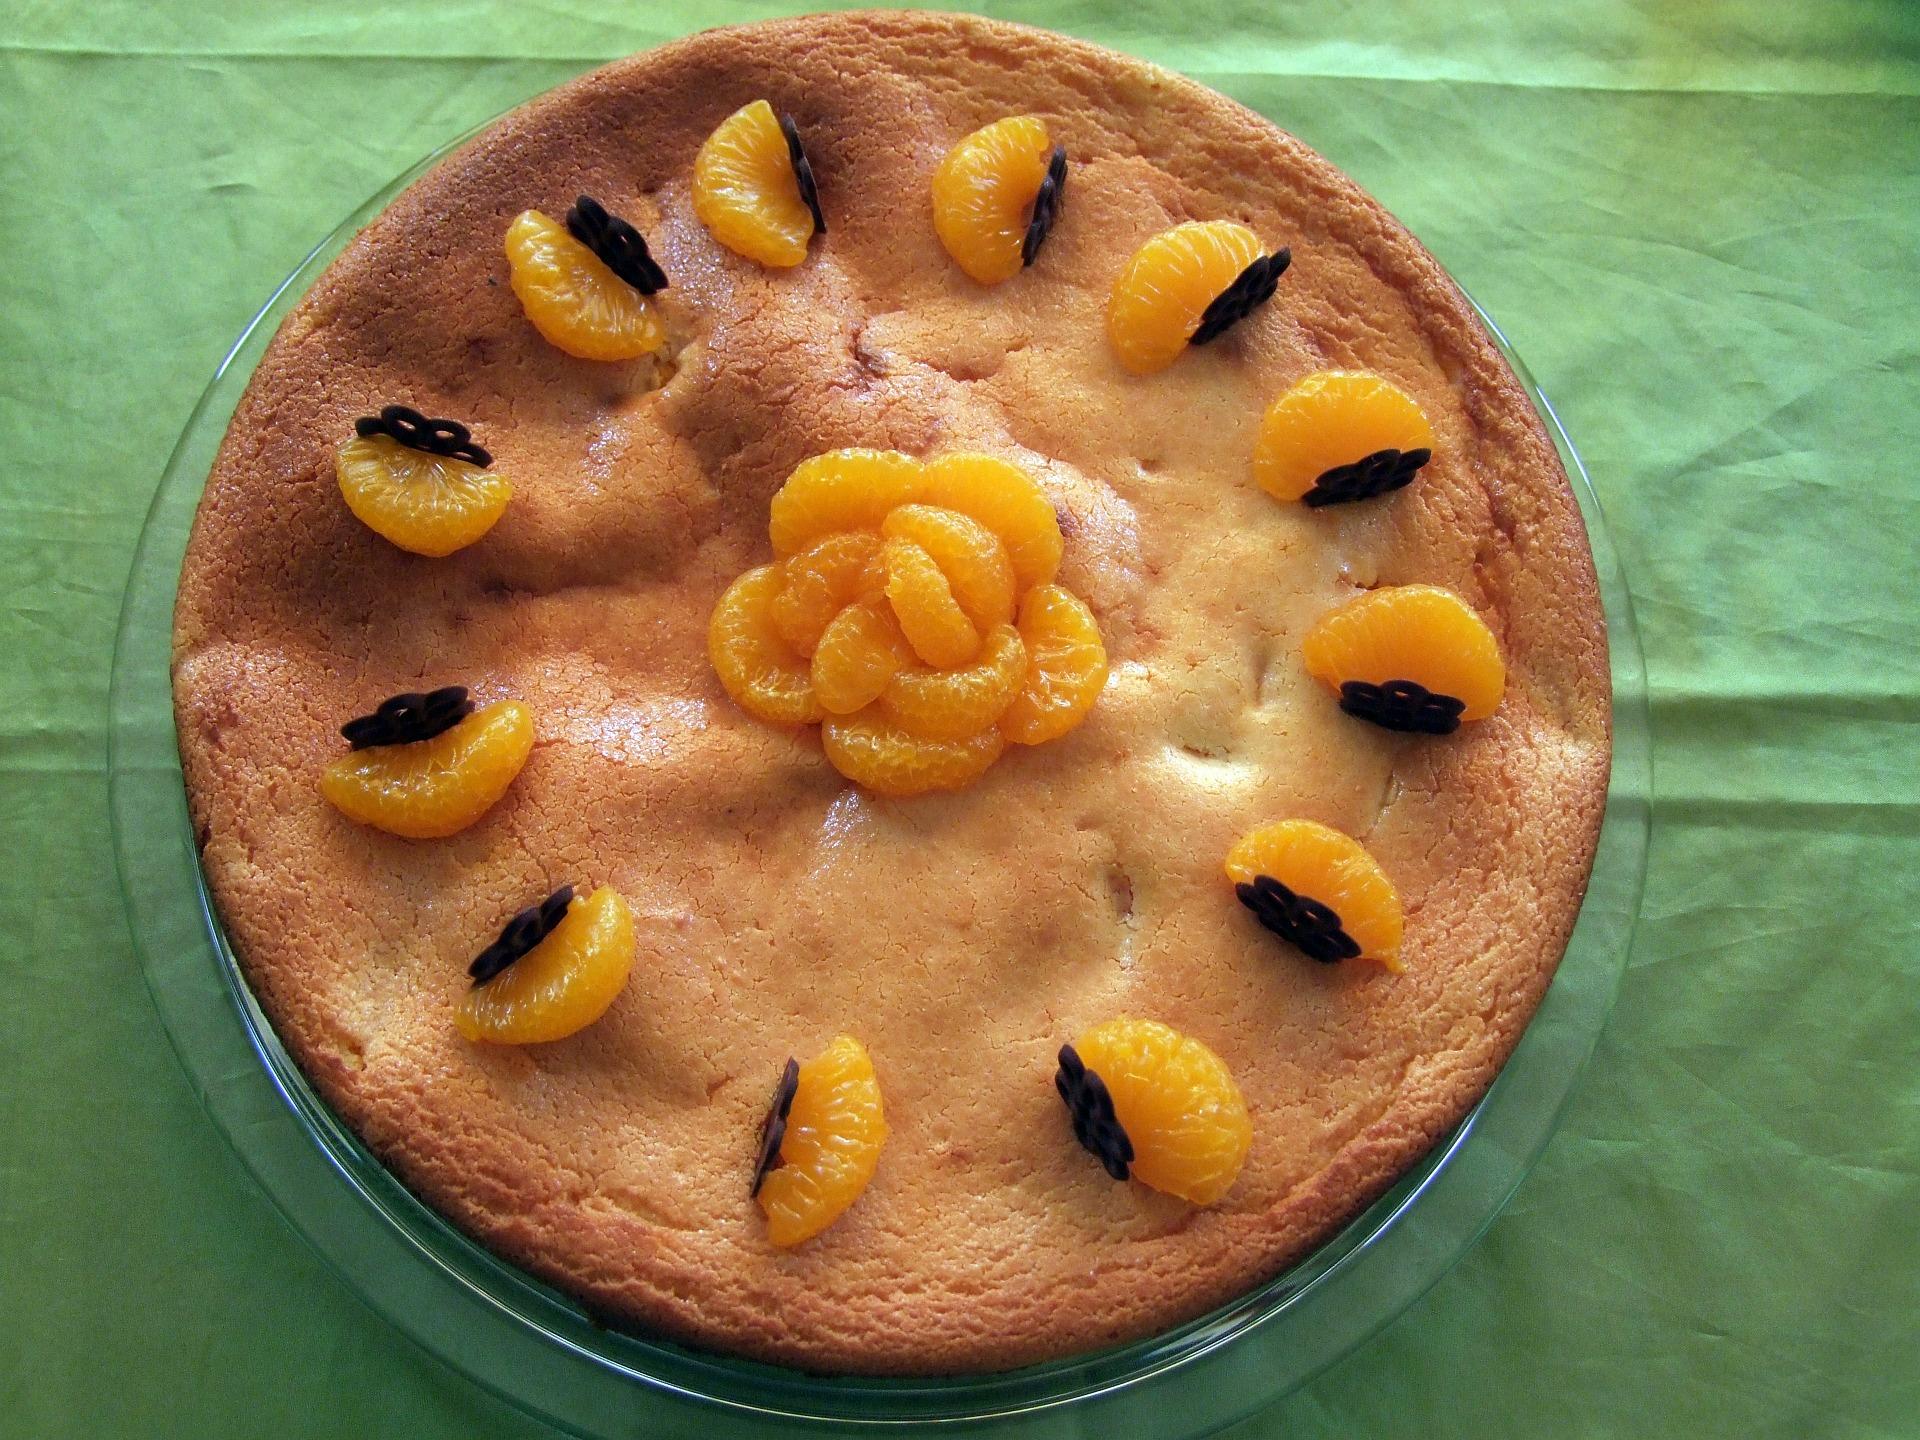 cake-371708_1920